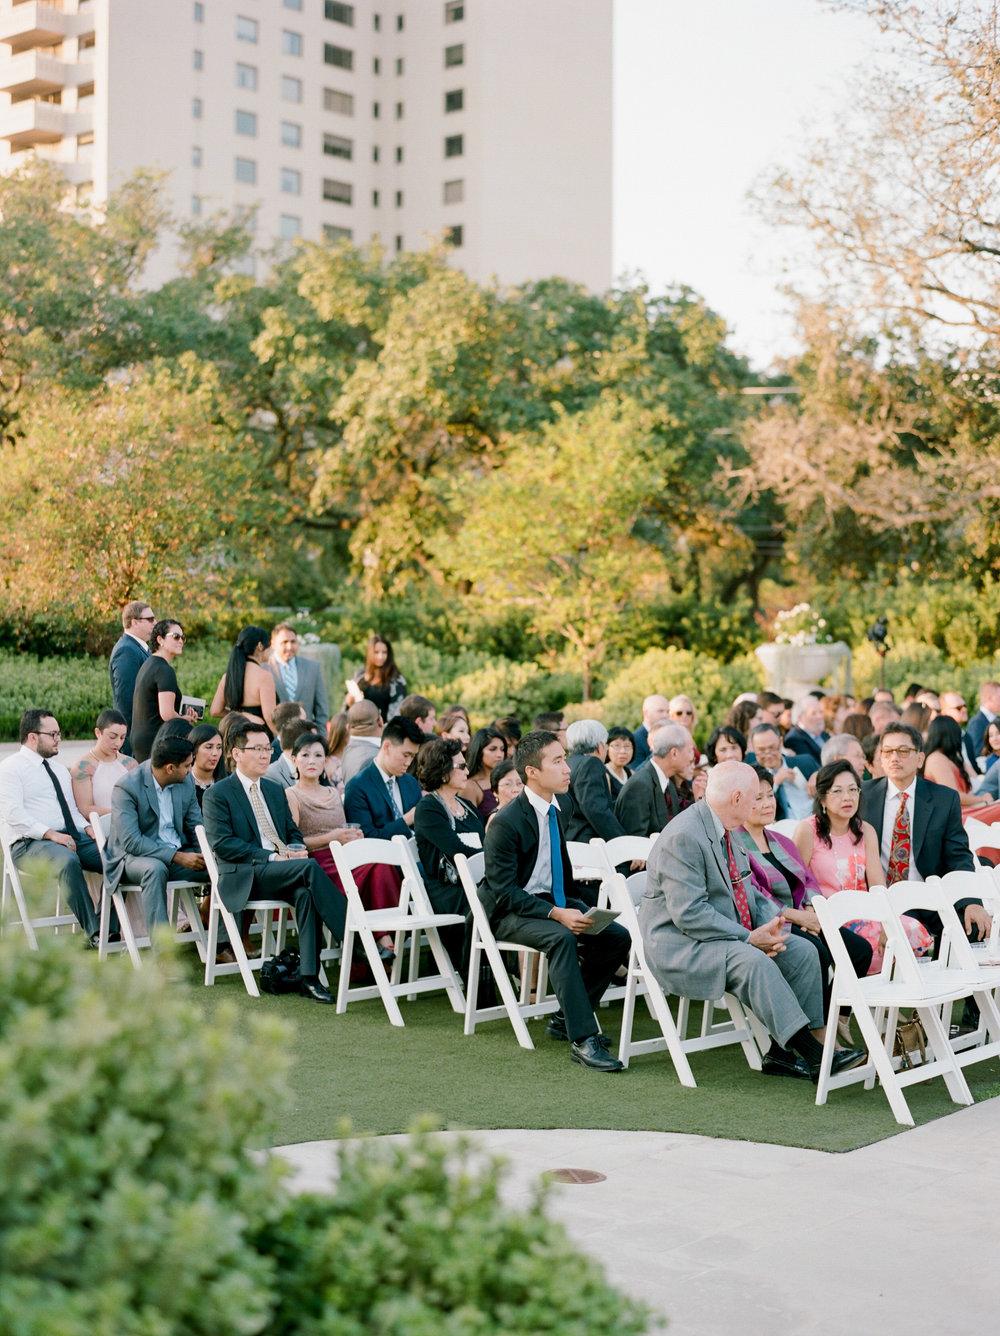 Martha-Stewart-Wedding-Dana-Fernandez-Photography-Josh-Texas-Film-Houston-Wedding-Fine-Art-Photographer-McGovern-Centennial-Gardens-Top-Best-34.jpg